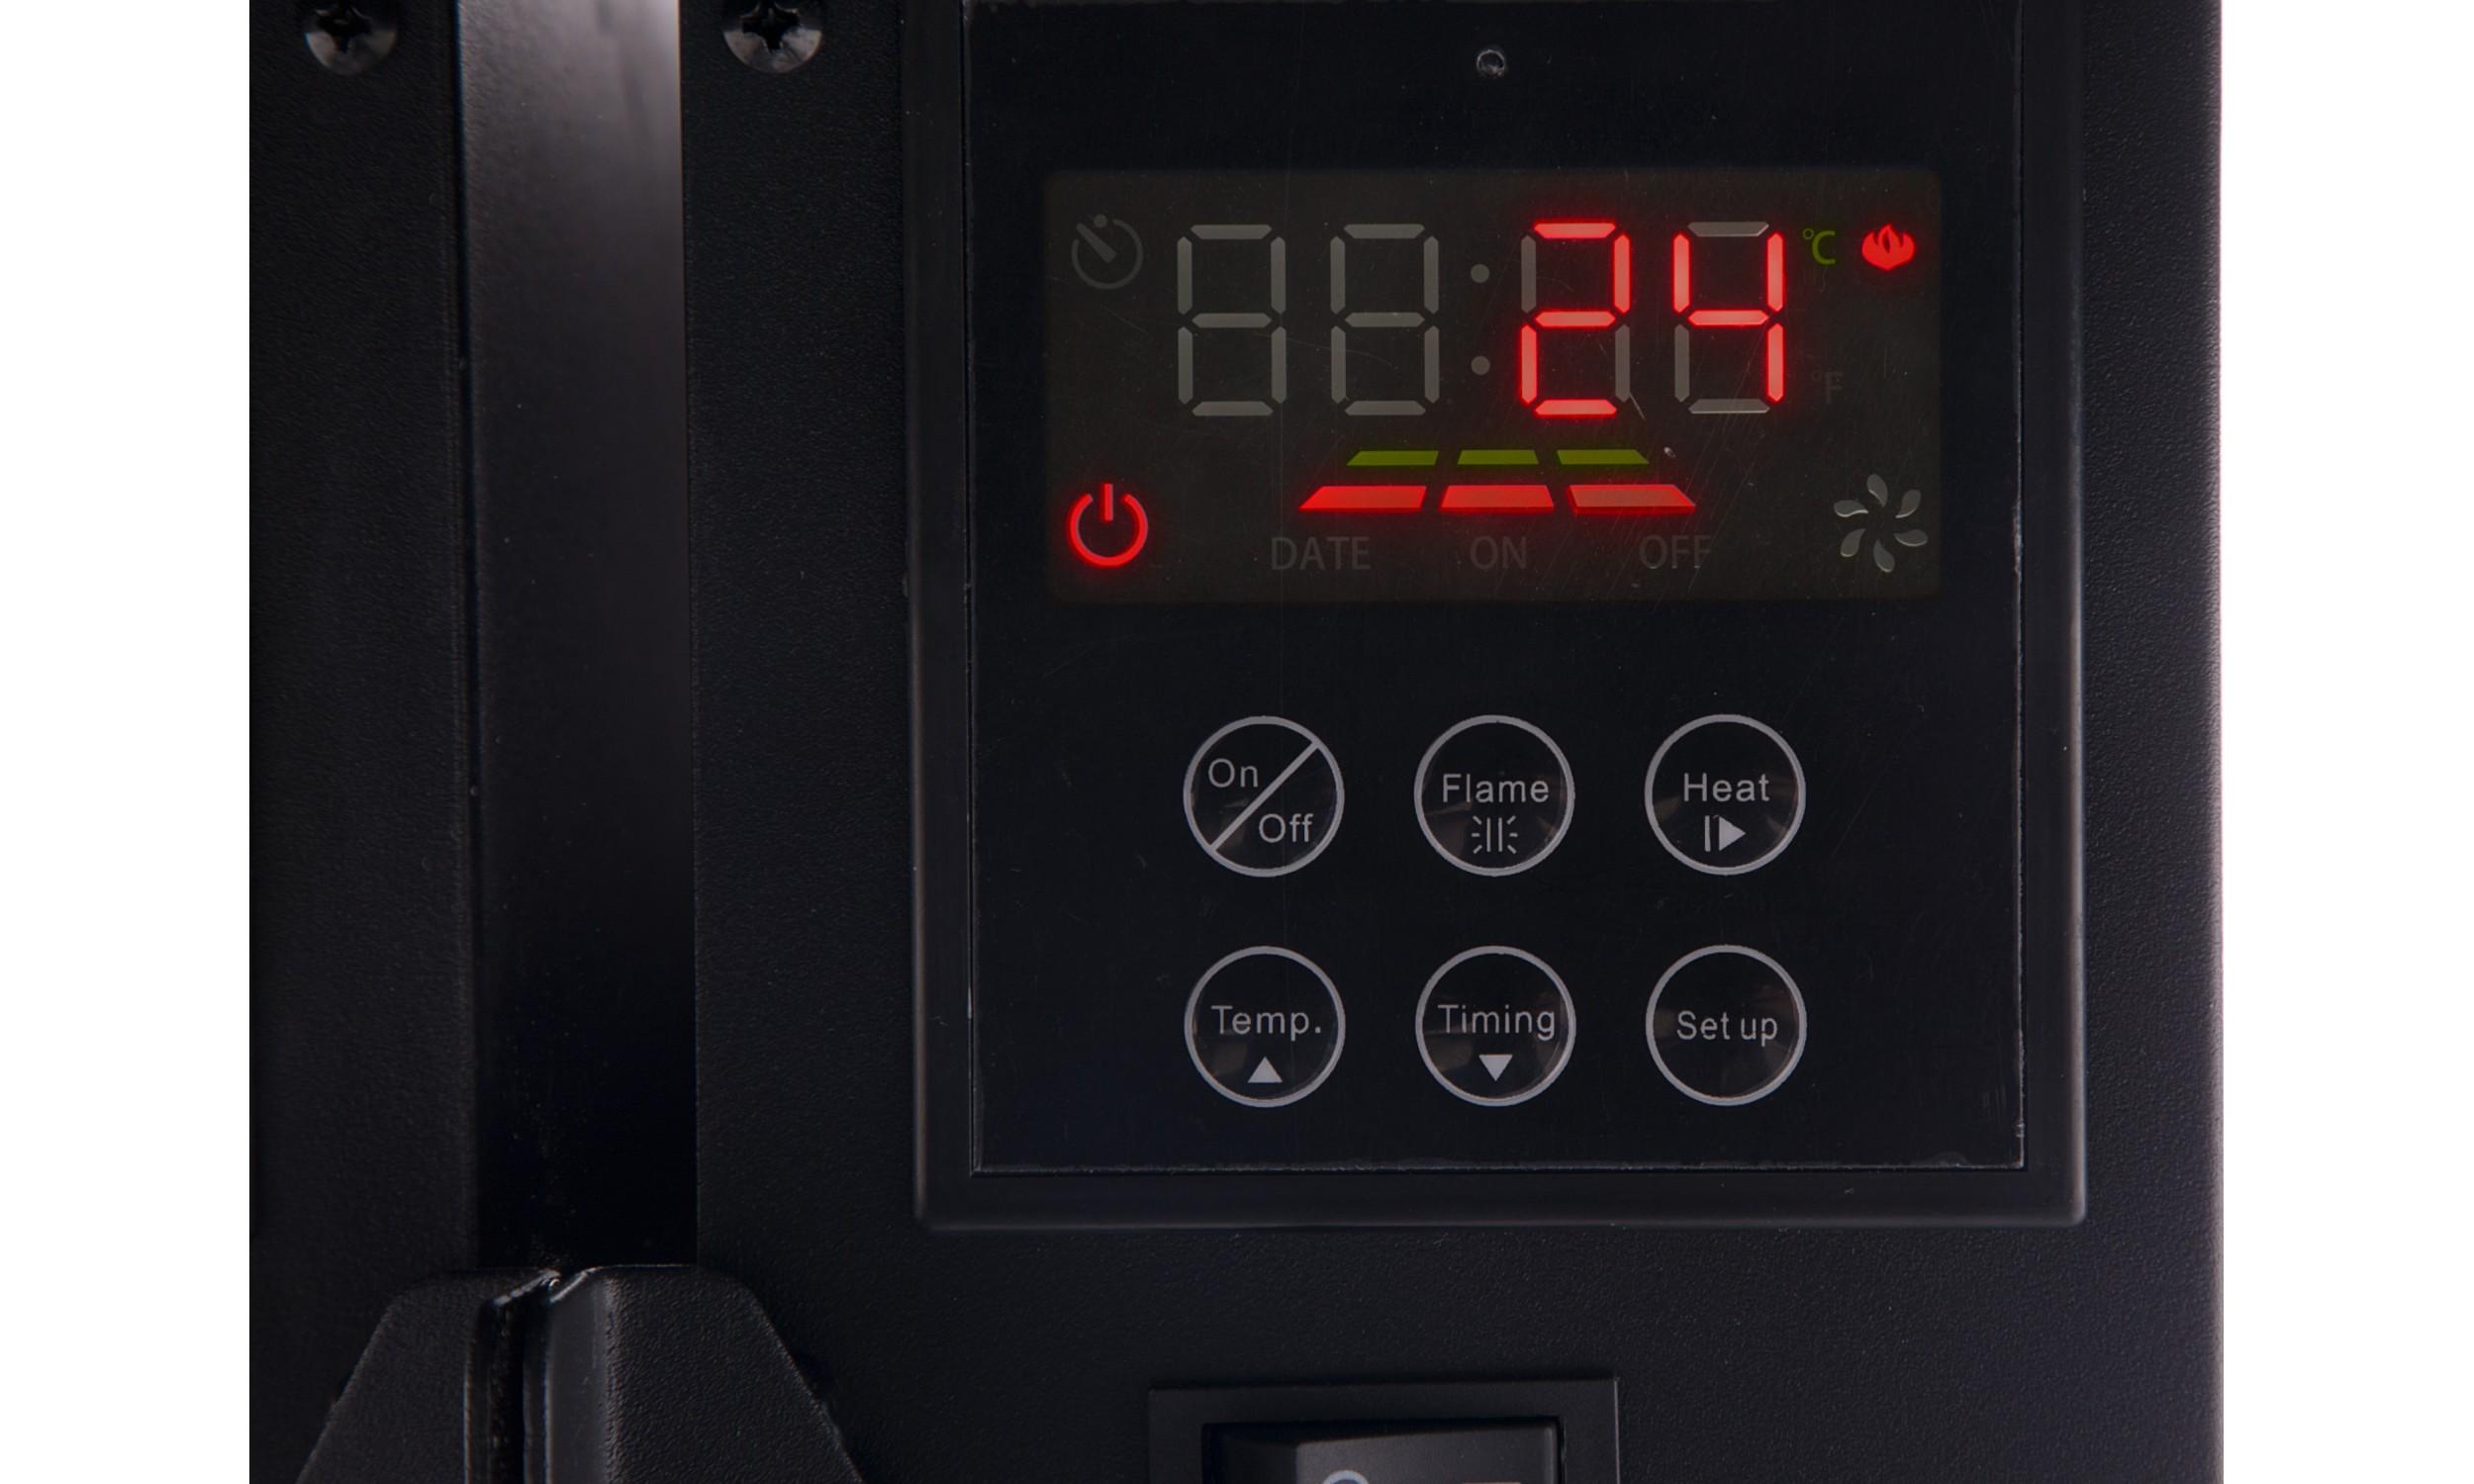 Chimenea Eléctrica Panorámica con luz LED ambiental CHE-510 (Espejo)